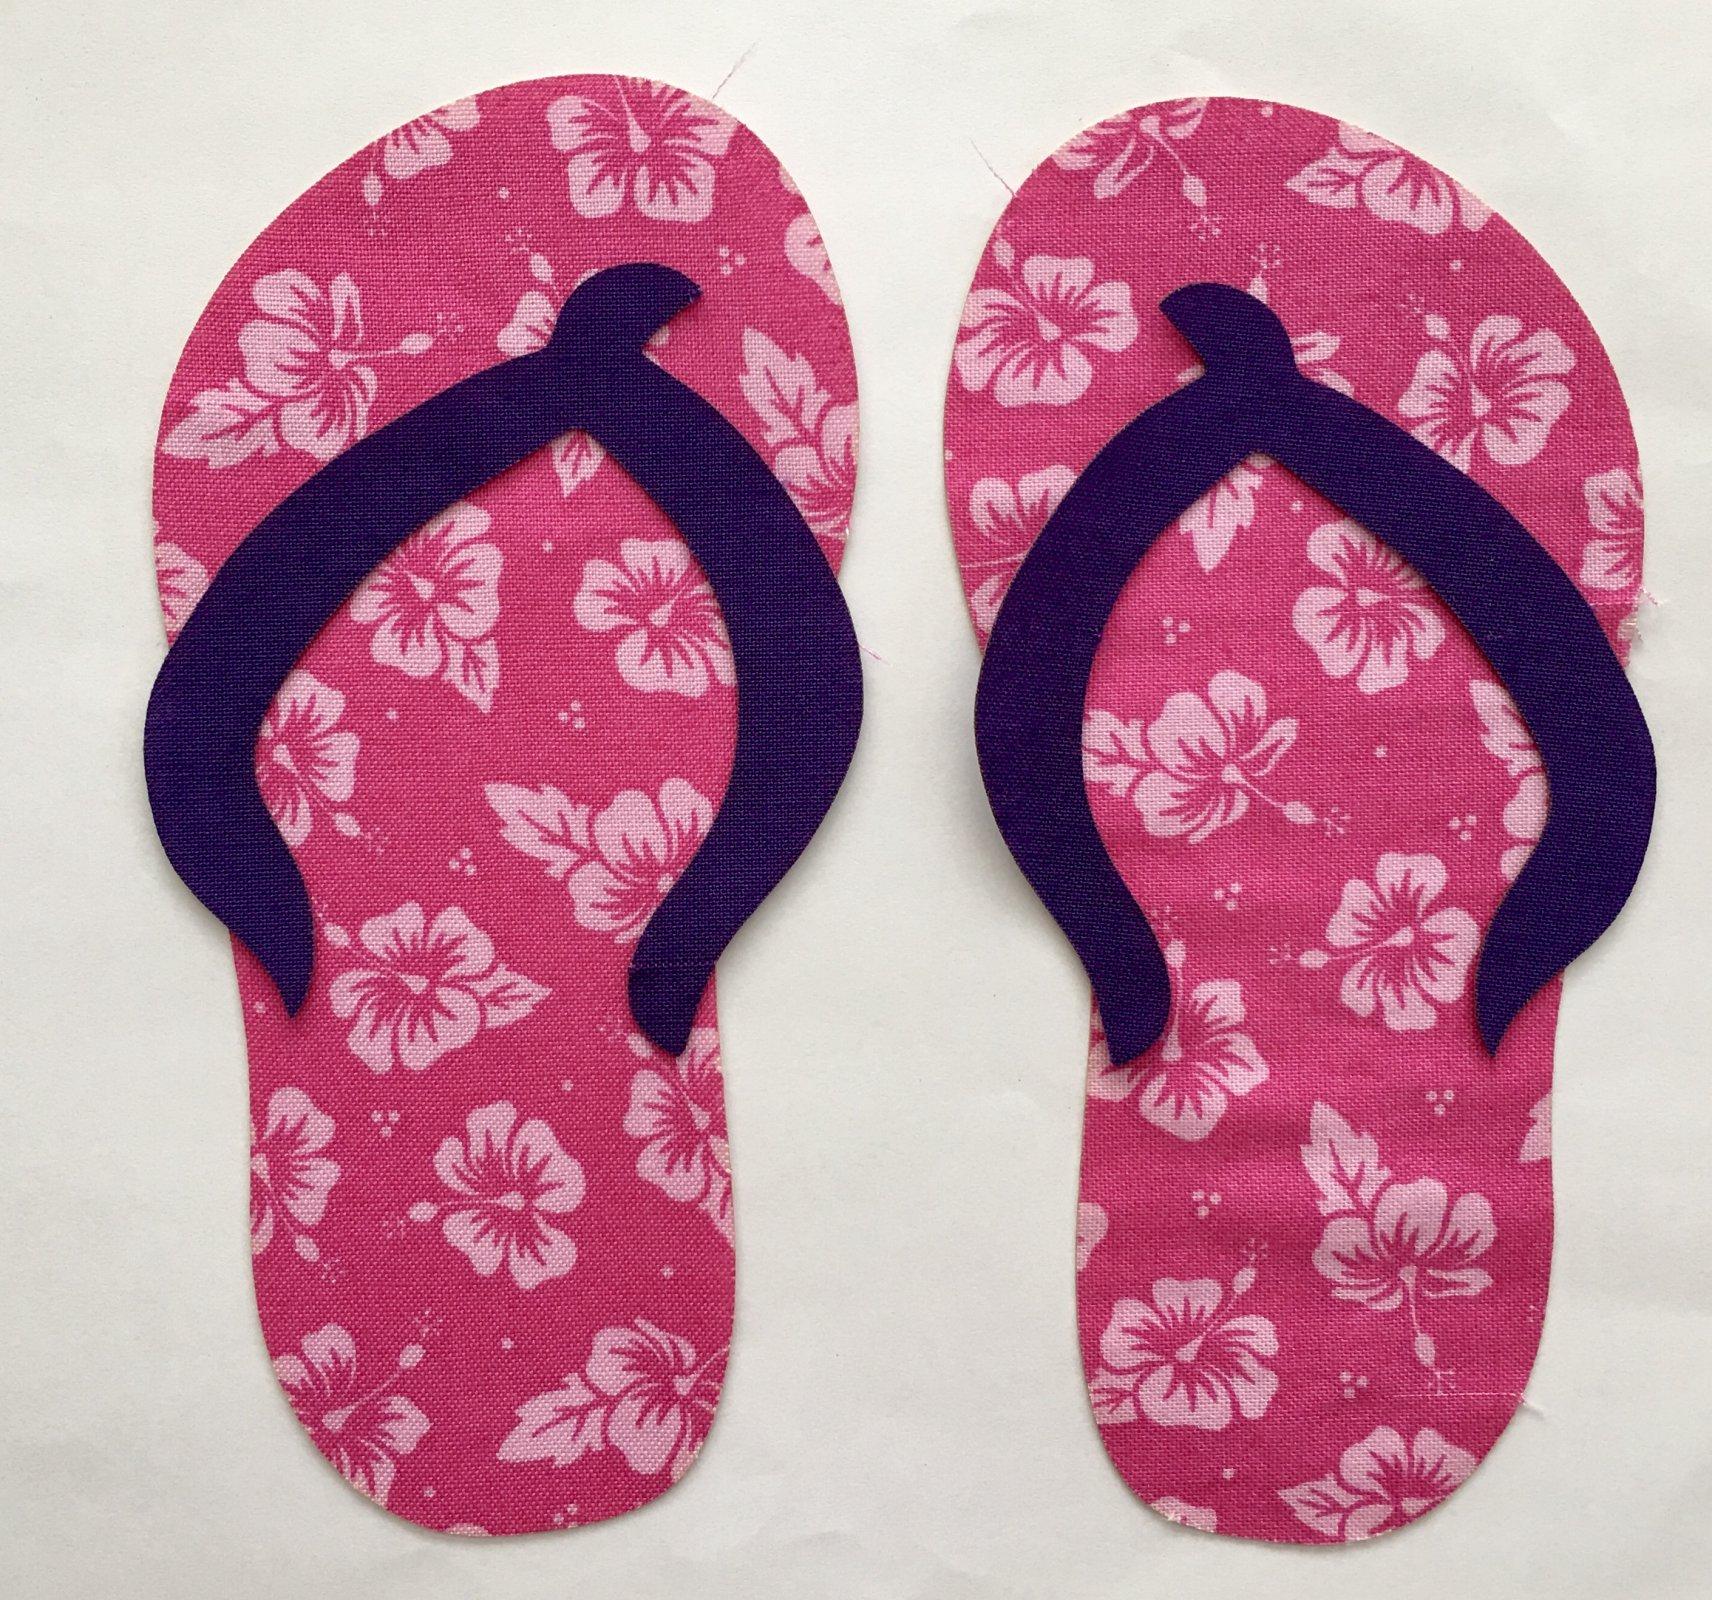 4in. Flip Flop Appliques 4 pairs